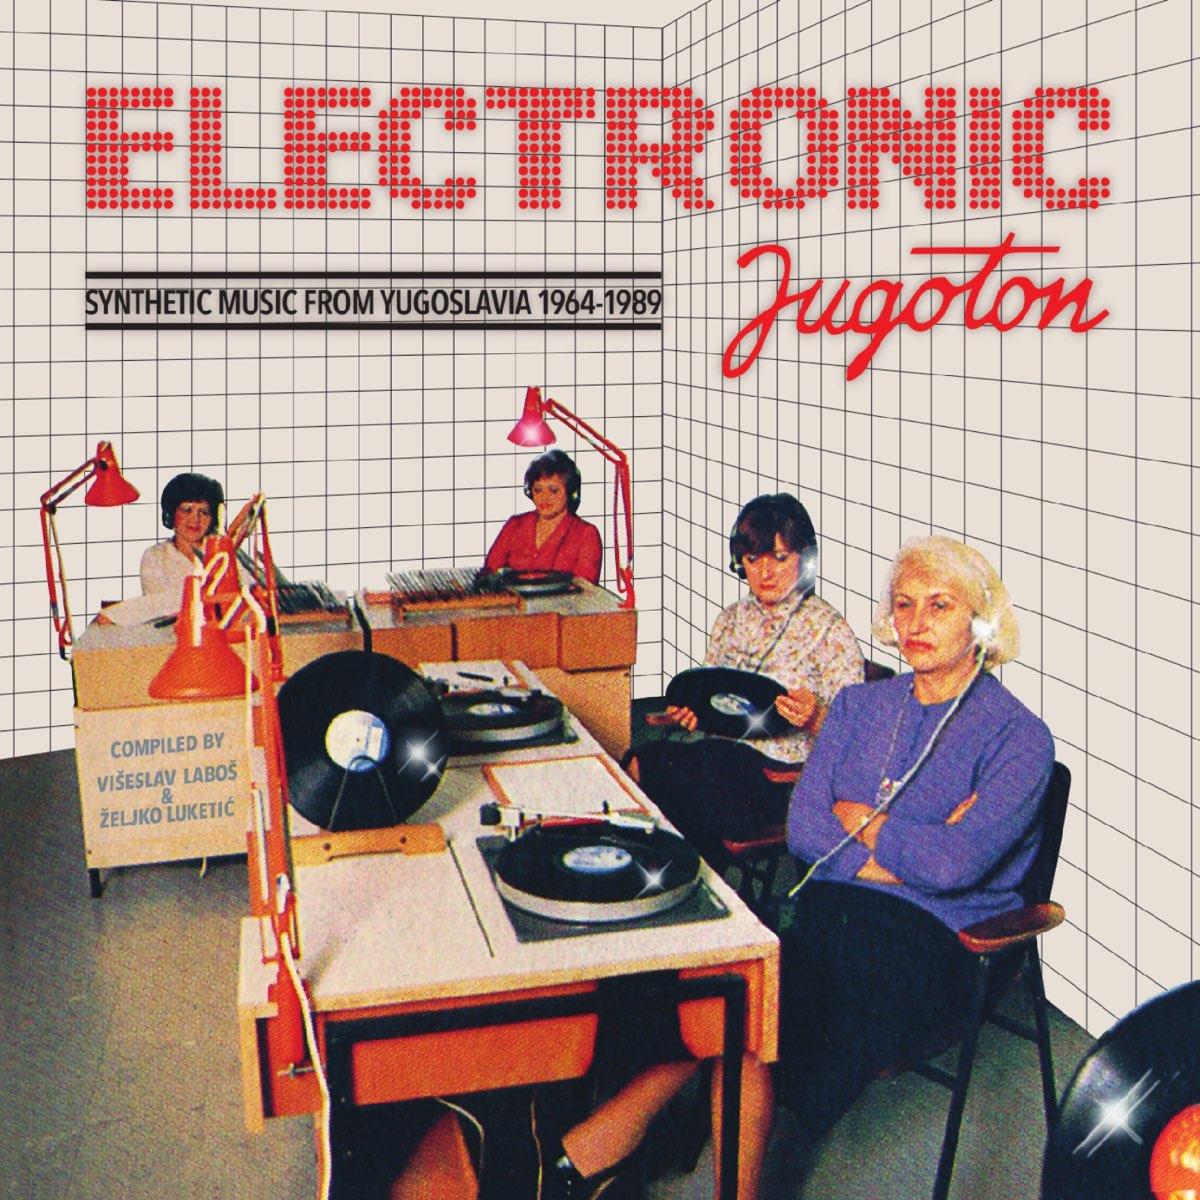 Electronic Jugoton - Synthetic Music From Yugoslavia 1964-1989 par Razni Izvođači sur Apple Music